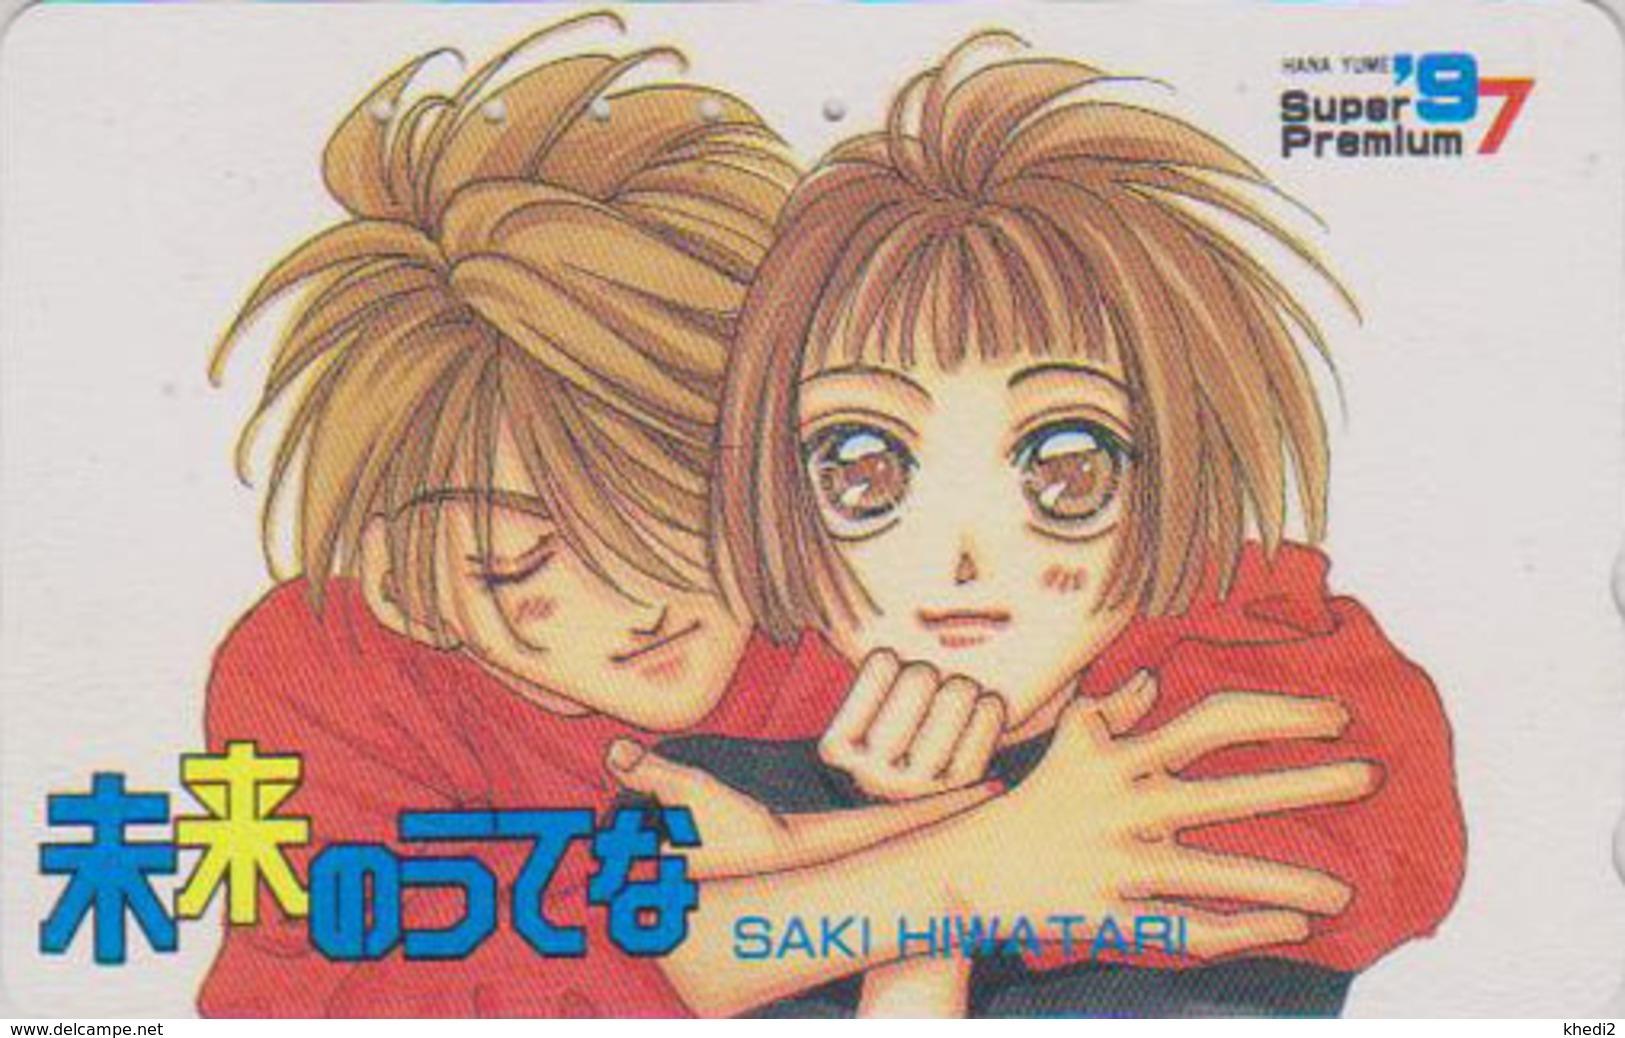 Télécarte Japon / 110-016 - MANGA - HANA TO YUME - * Série PREMIUM 97 * By SAKI HIWATARI - ANIME Japan Phonecard - 11489 - BD